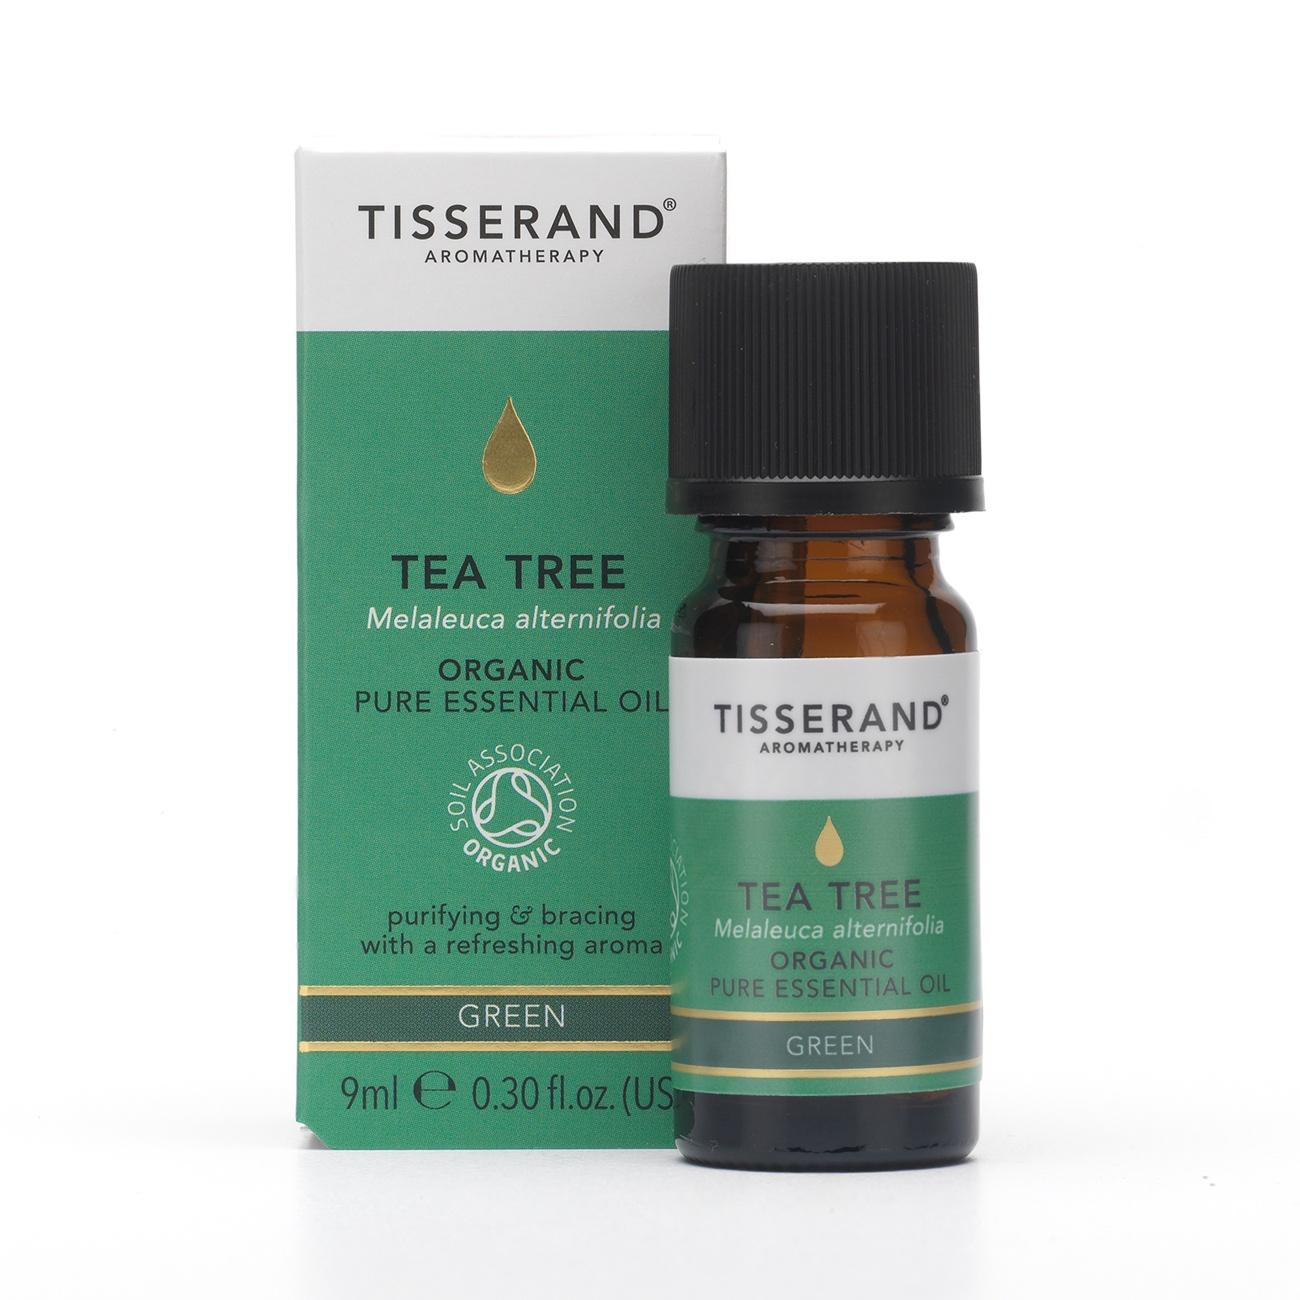 Tisserand Tea Tree Organic Essential Oil (9ml)